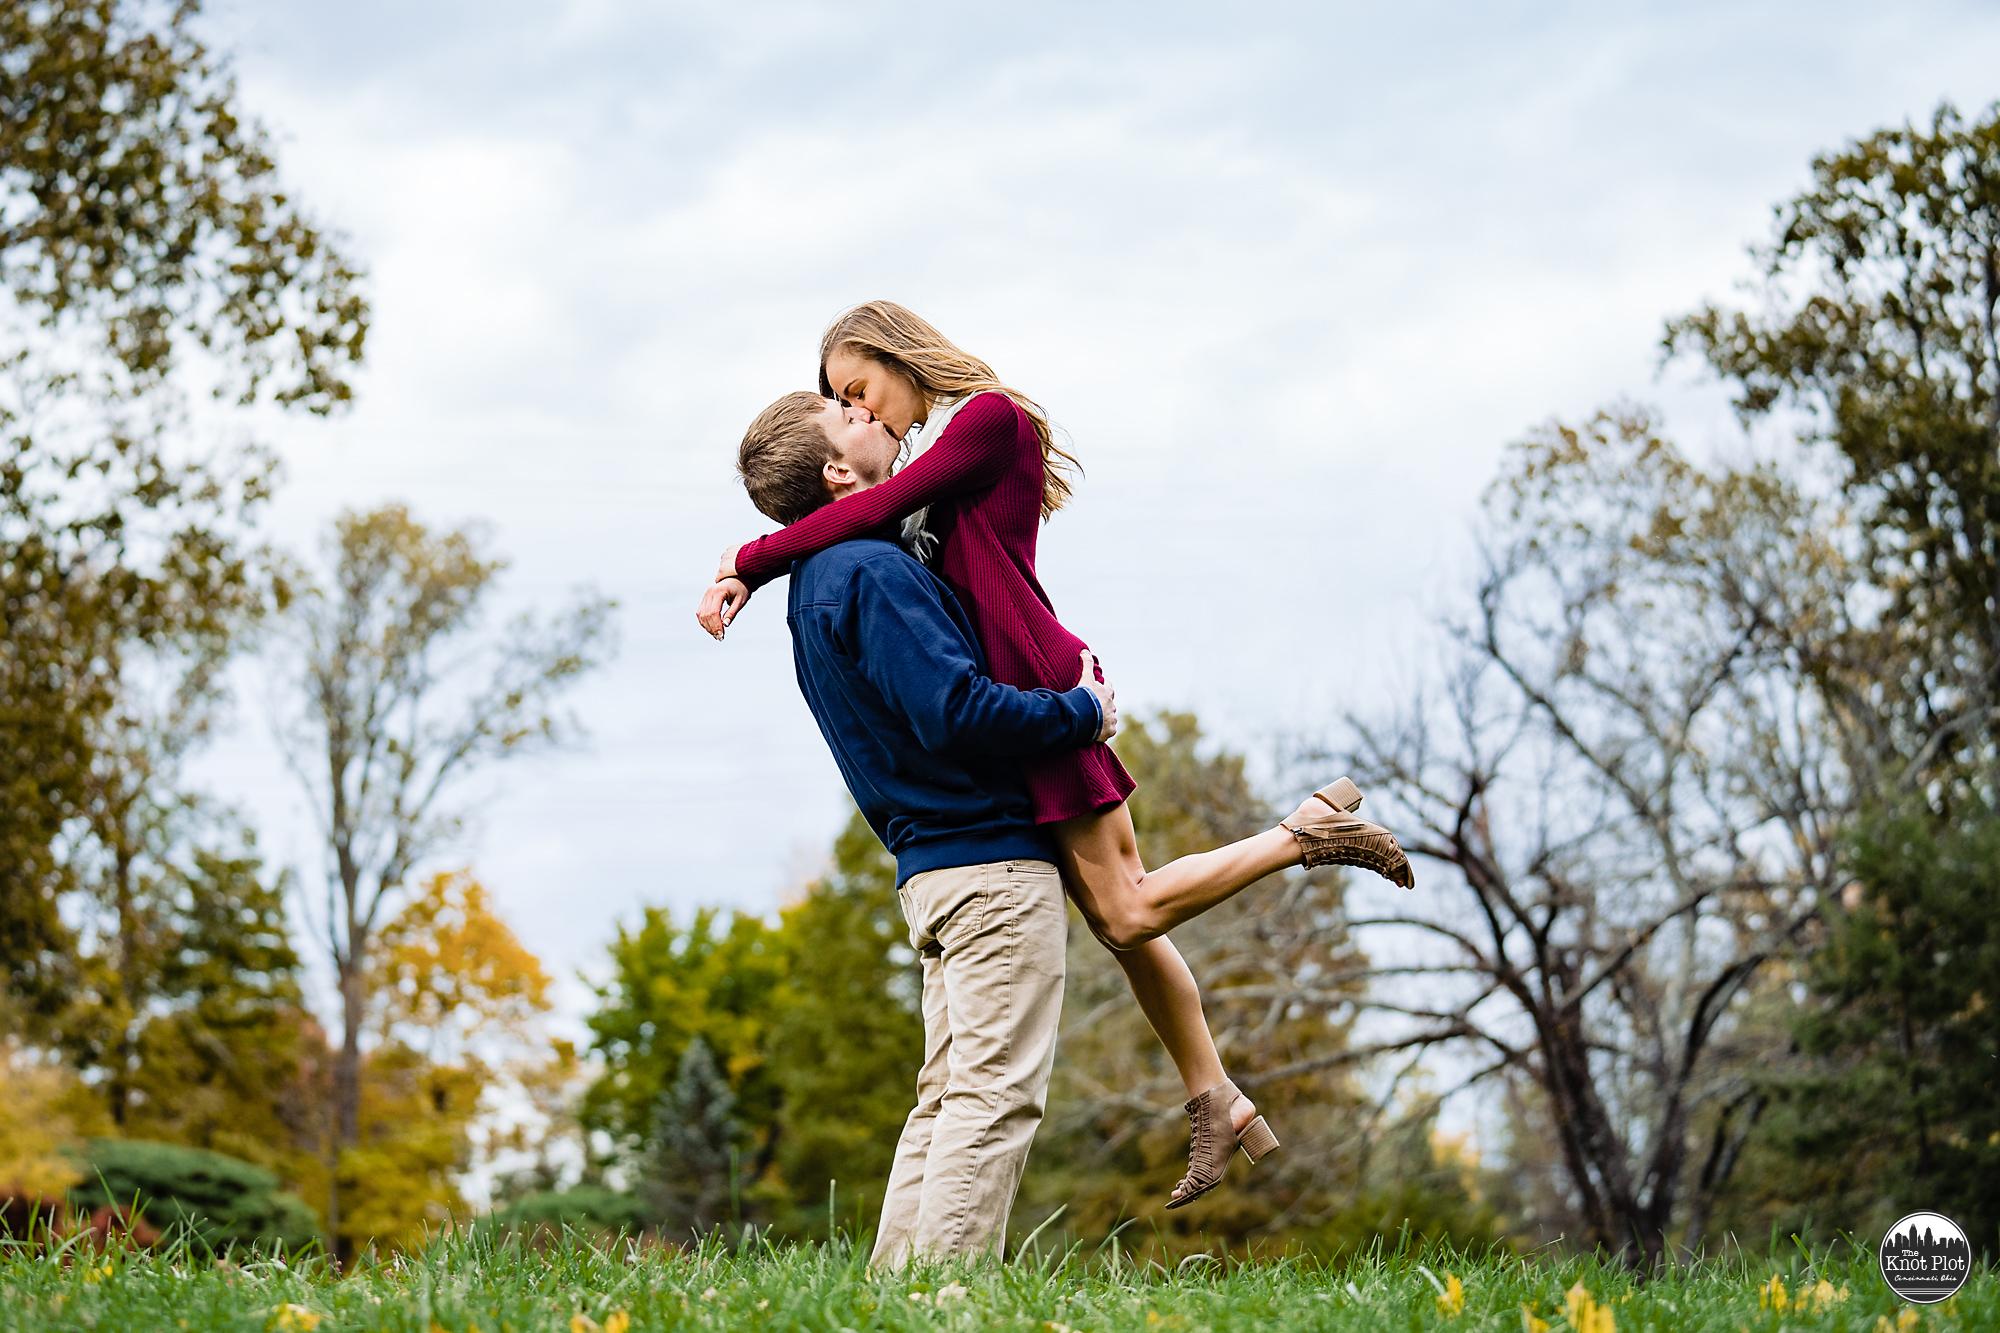 Mt-Airy-Arboretum-Engagement-Photography-Session-9.jpg